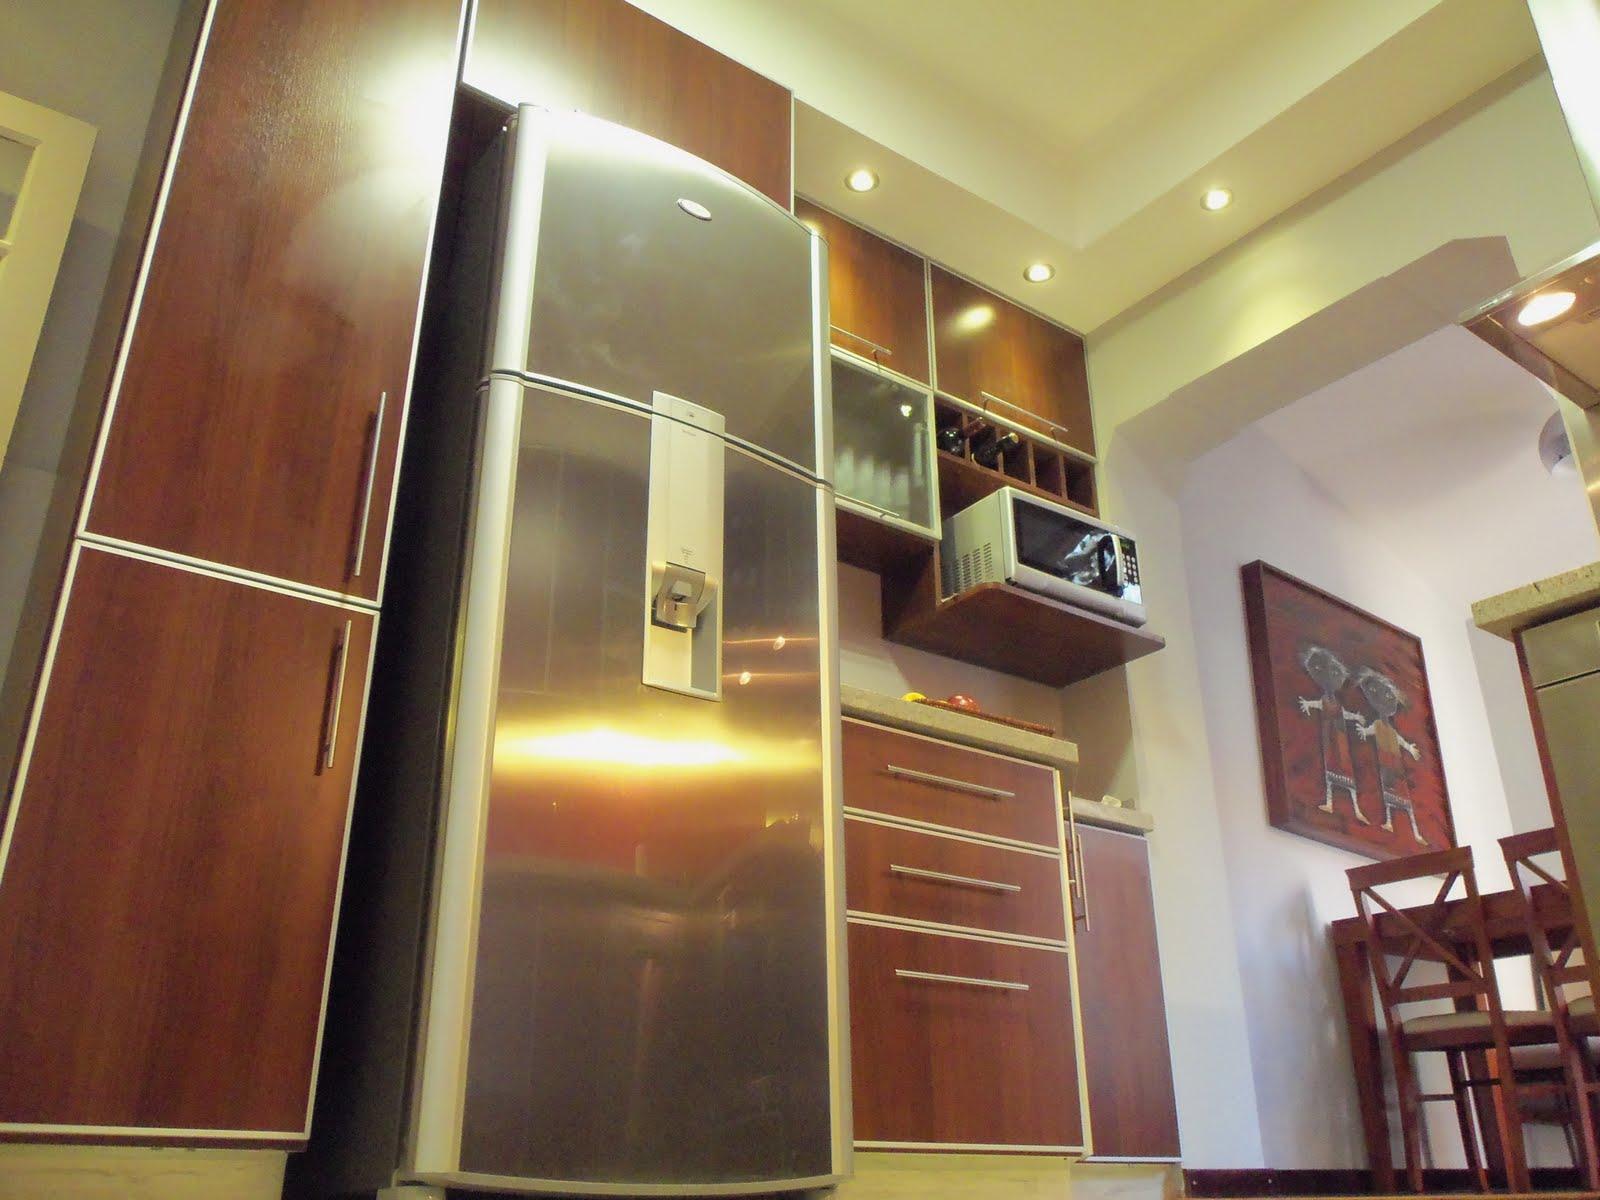 Deco vanguardia cocina moderna y tecnologica for Casa moderna tecnologica